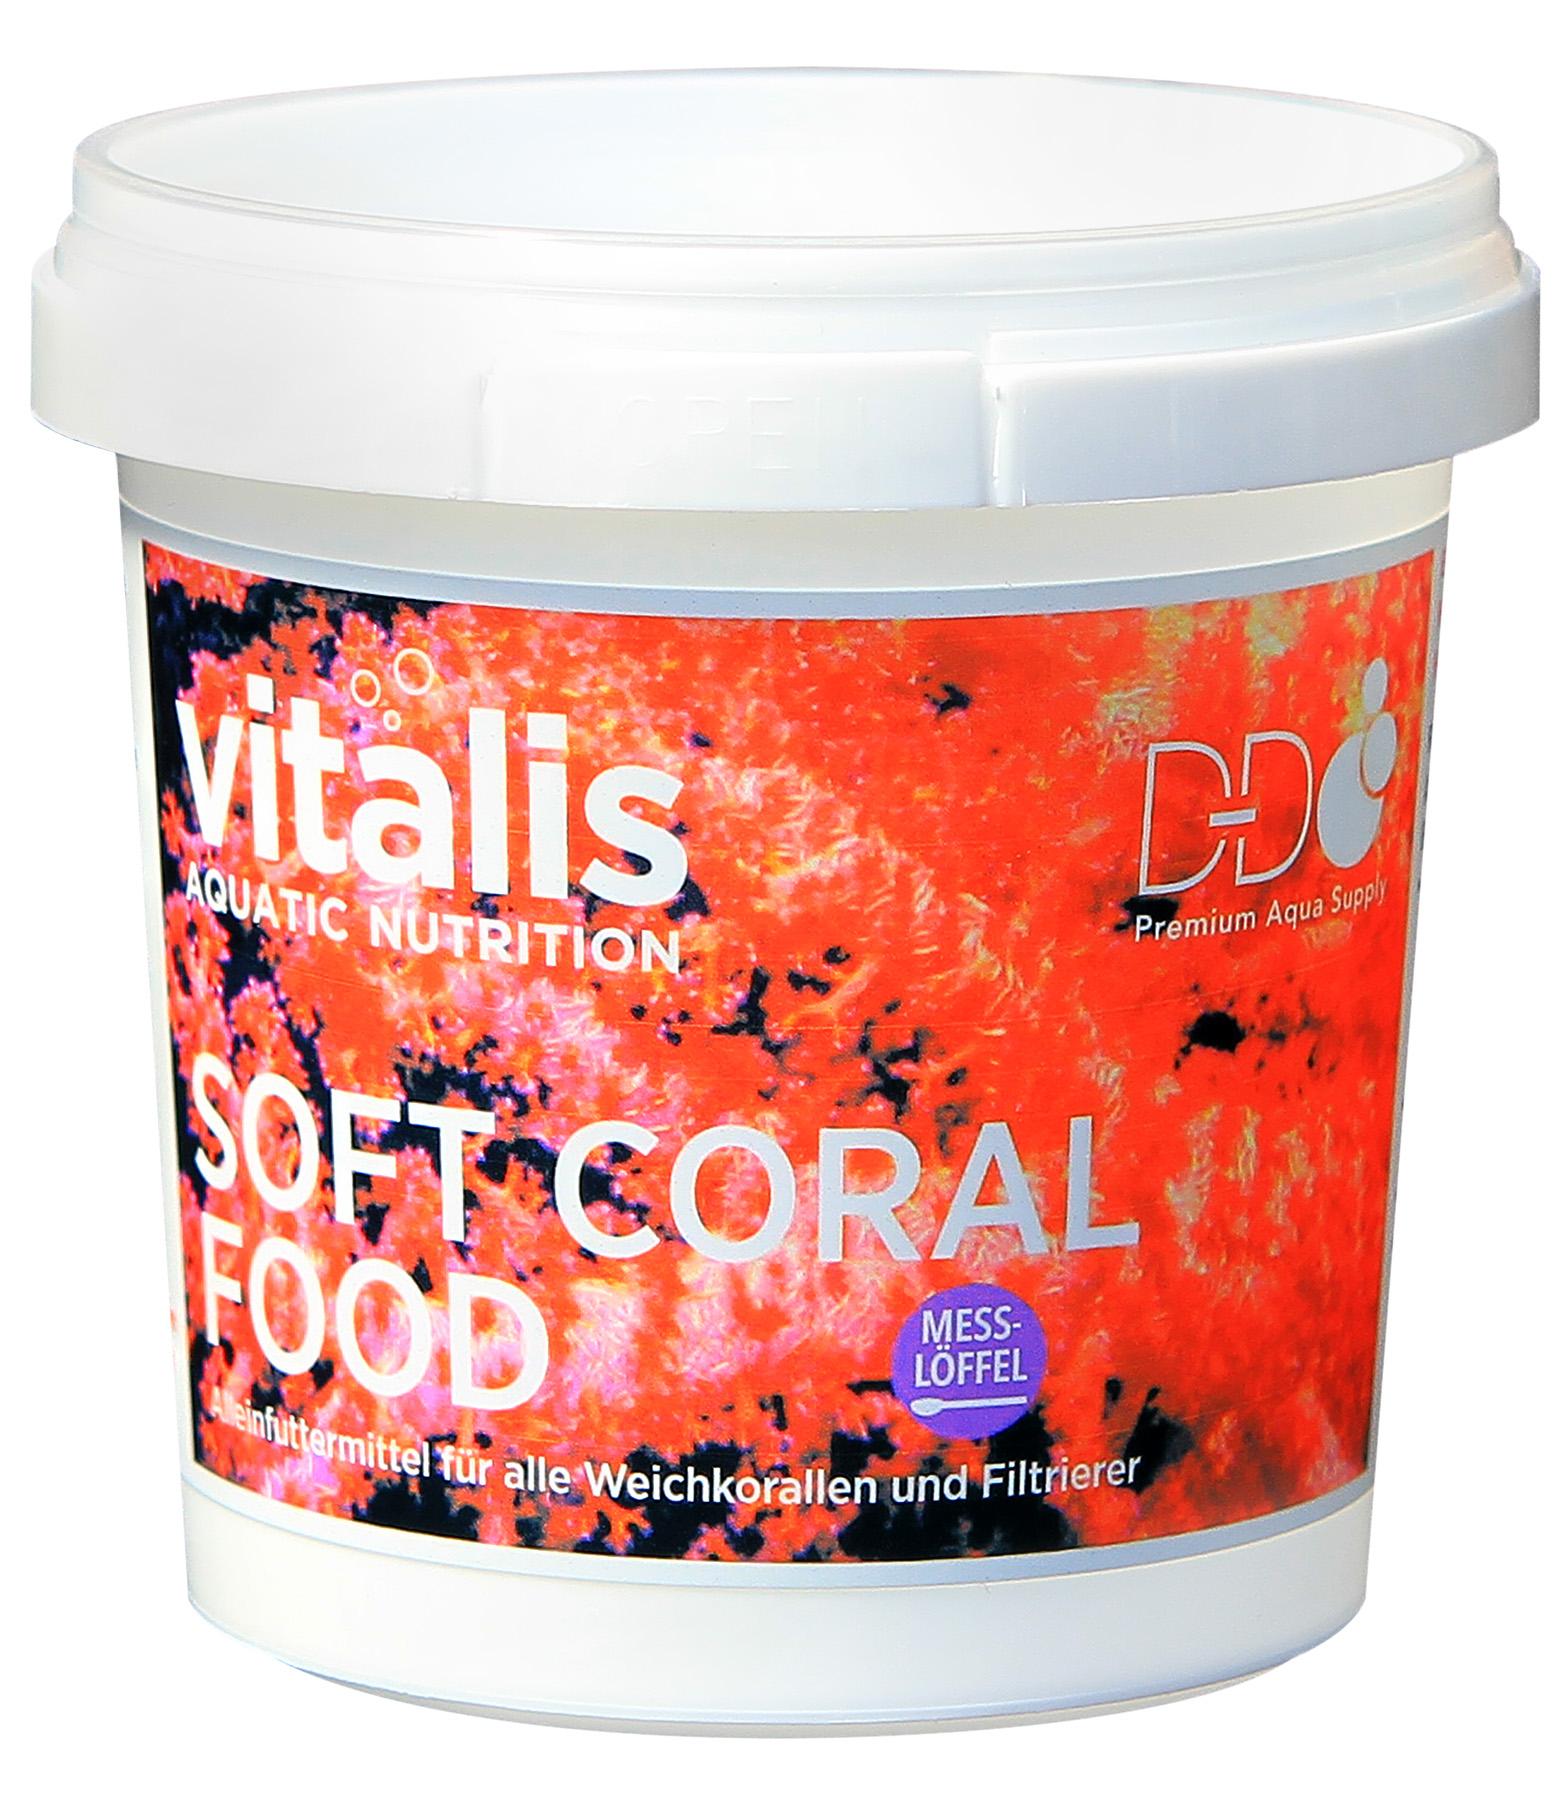 Vitalis Coral Food - Soft Coral Mikro-Flocken 50g